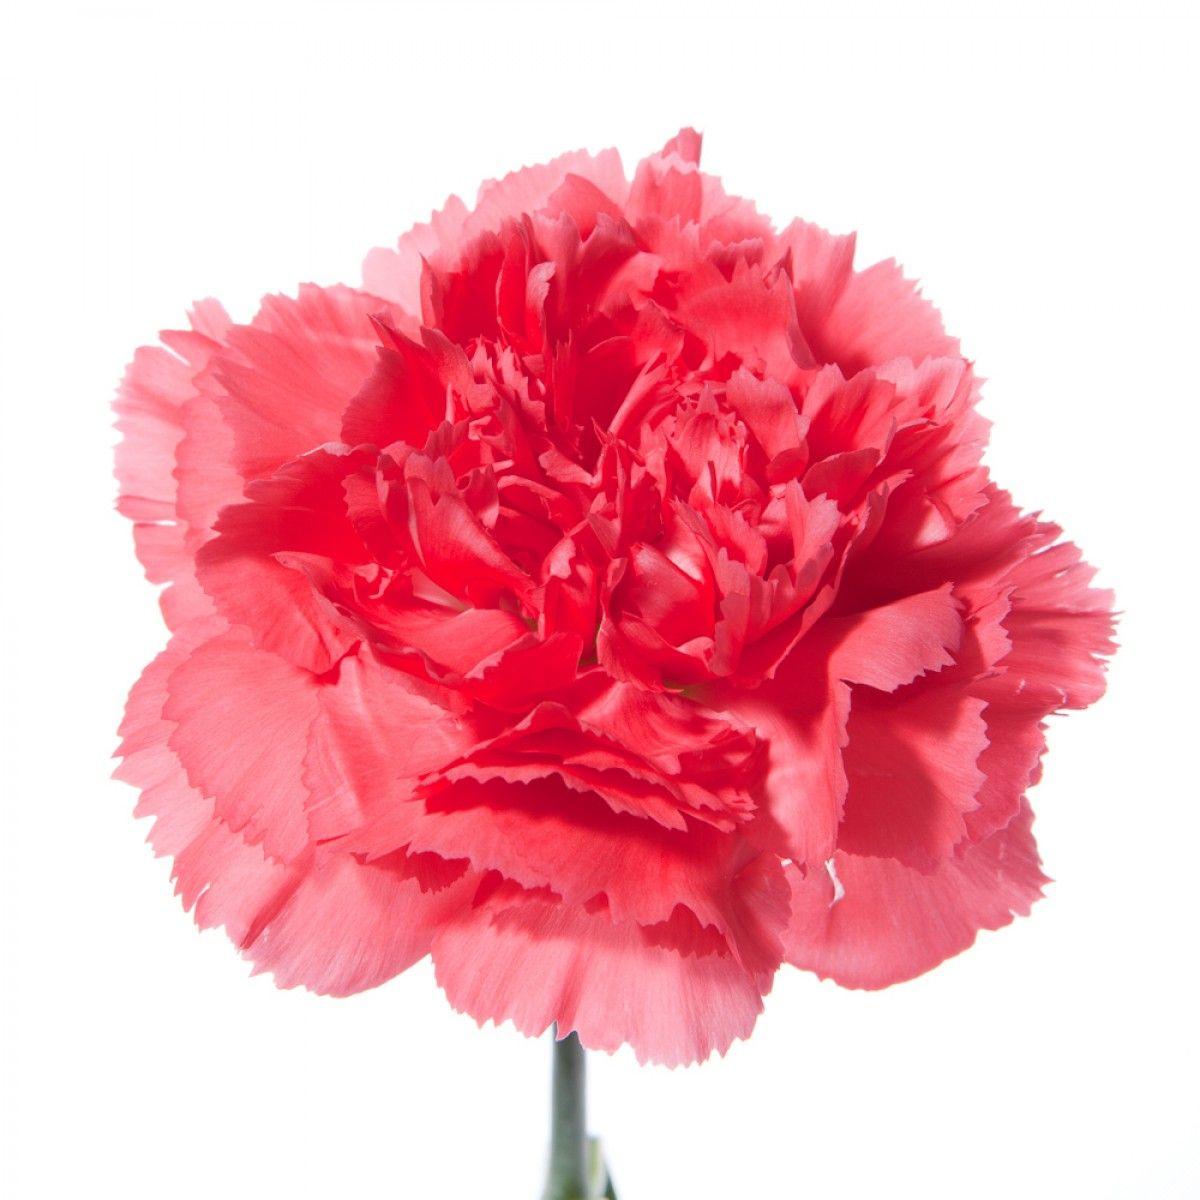 Carnations Dianthus Uses Round Mound Designs Vase Designs Wearables Single Stem Sleeved Arrangeme Types Of Flowers Flower Centerpieces Wedding Pink Flowers